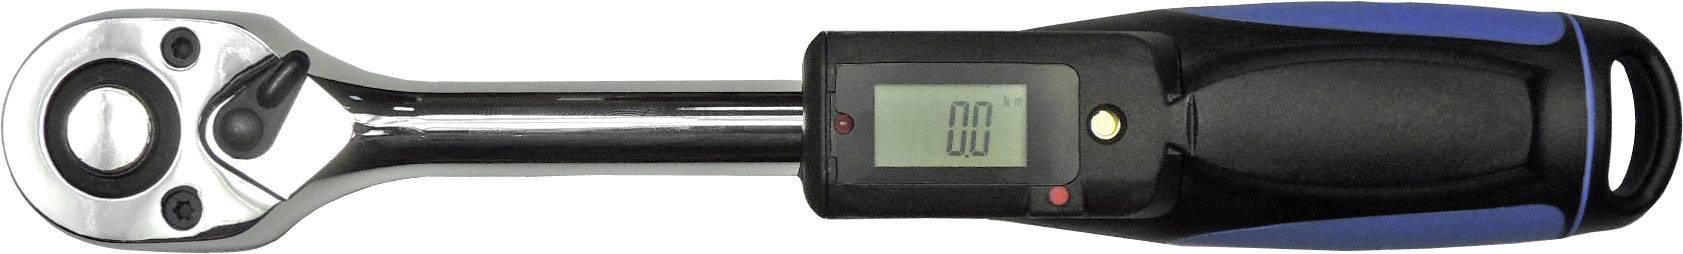 "Momentový klíč Kunzer Drehmomentknarre 1/2"" (20-100 NM) 7DMK12, 1/2"" (12,5 mm), 20 - 100 Nm"